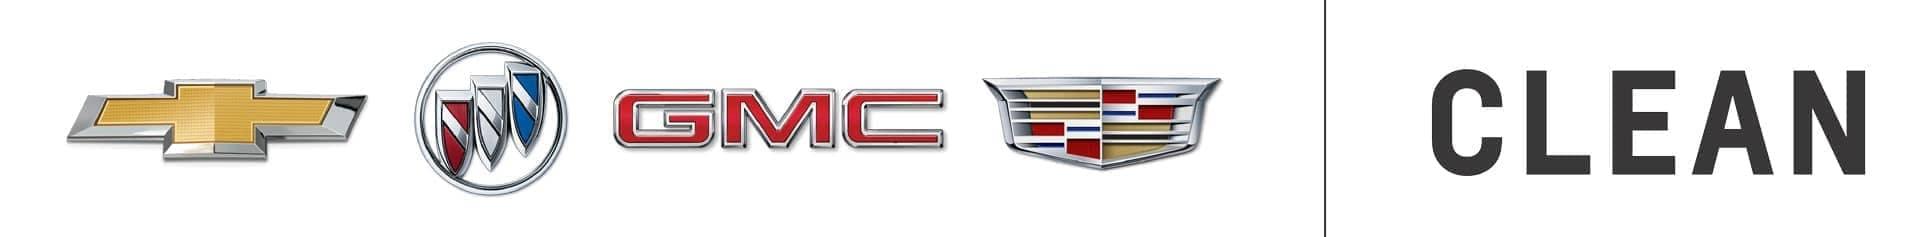 Chevrolet Buick GMC Cadillac Dealership Clean